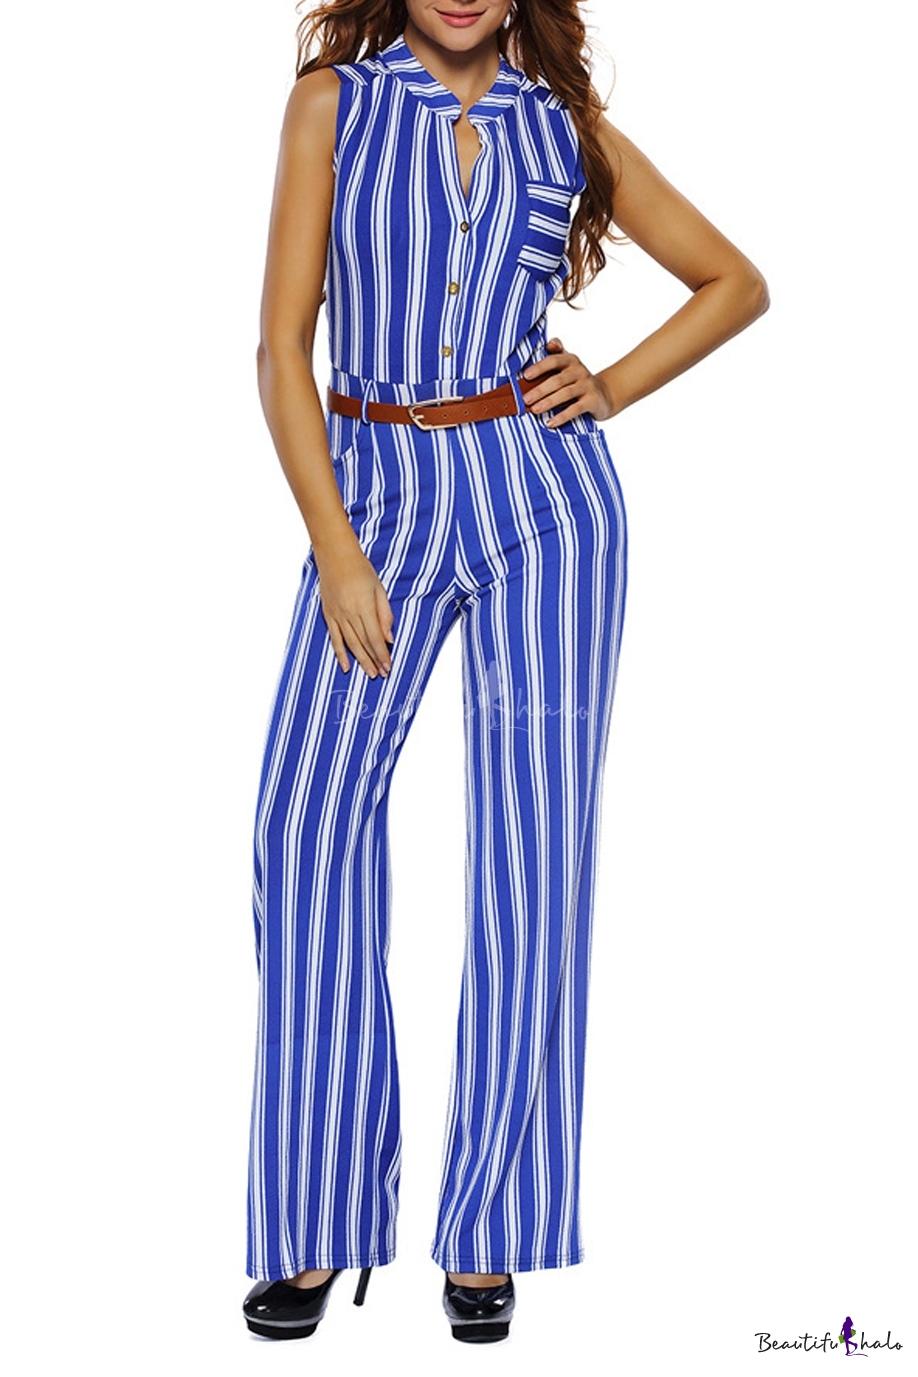 Buy Women's Striped Elegant Button Loose Long Wide Leg Jumpsuits Romper